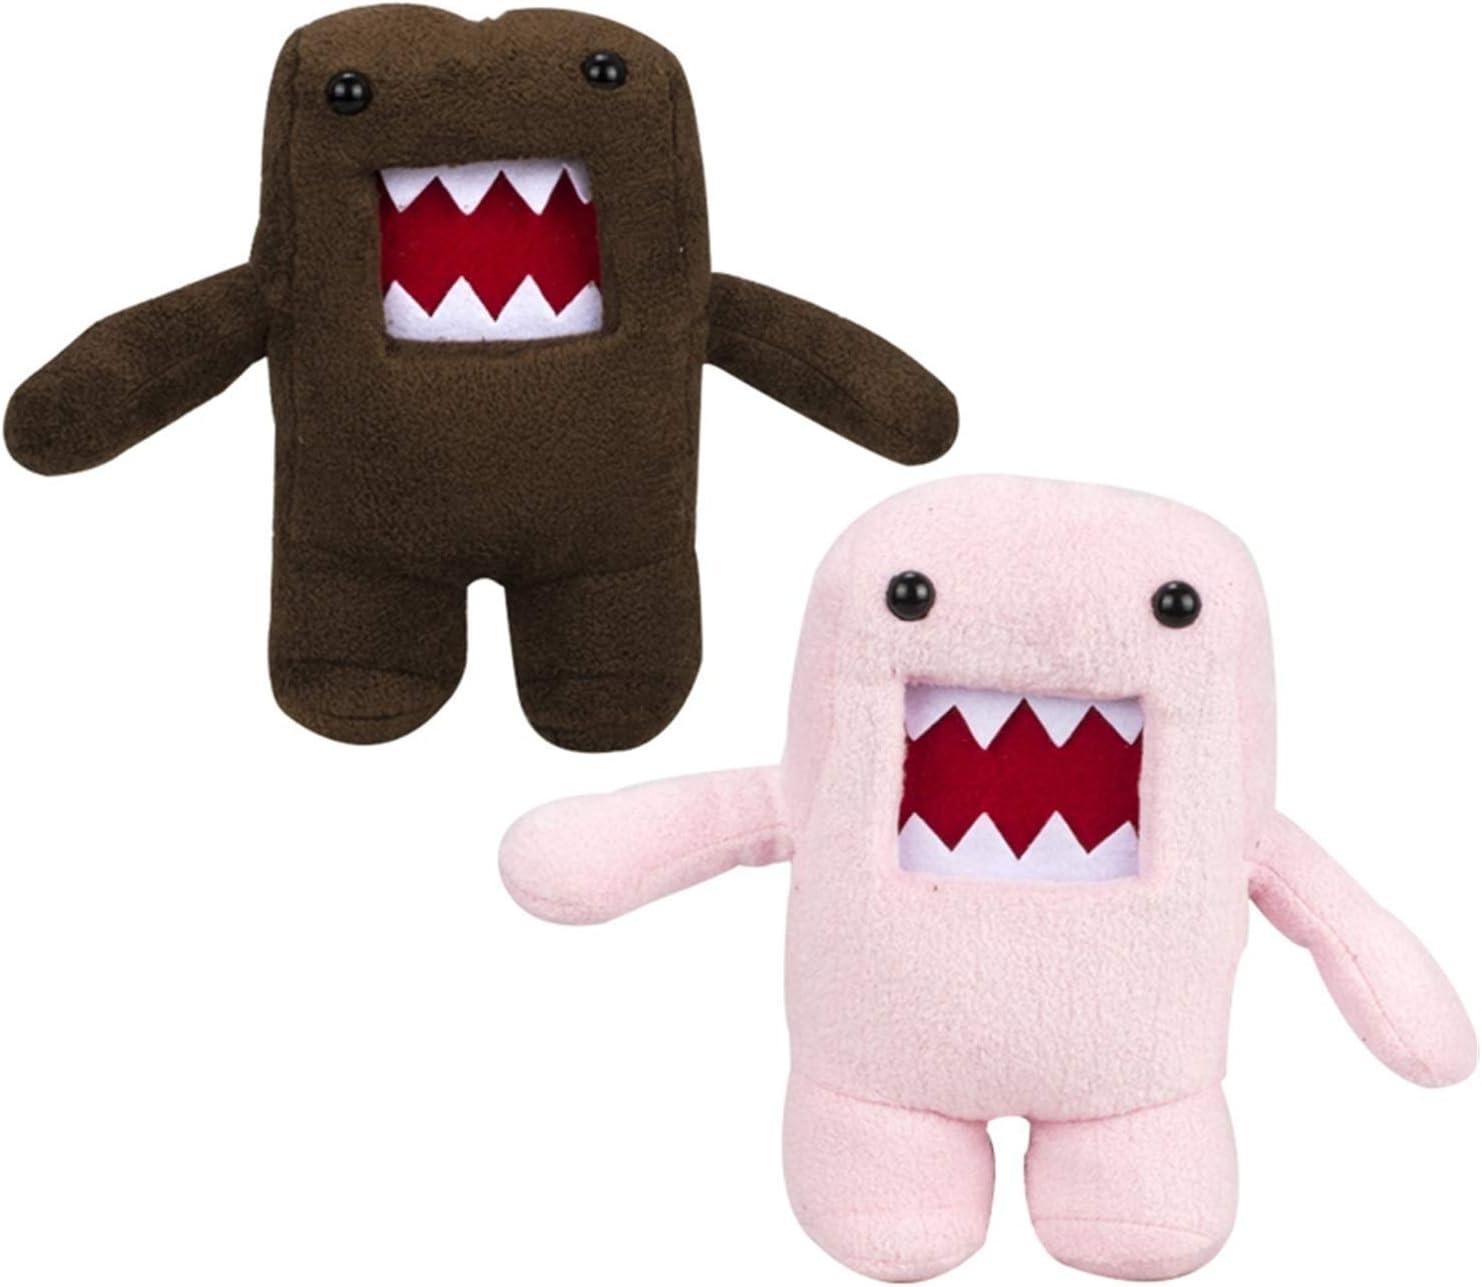 JUNMAIDZ Plush Overseas parallel import regular item Toys 20cm Kawaii Stuffed Genuine Funny Animals Toy